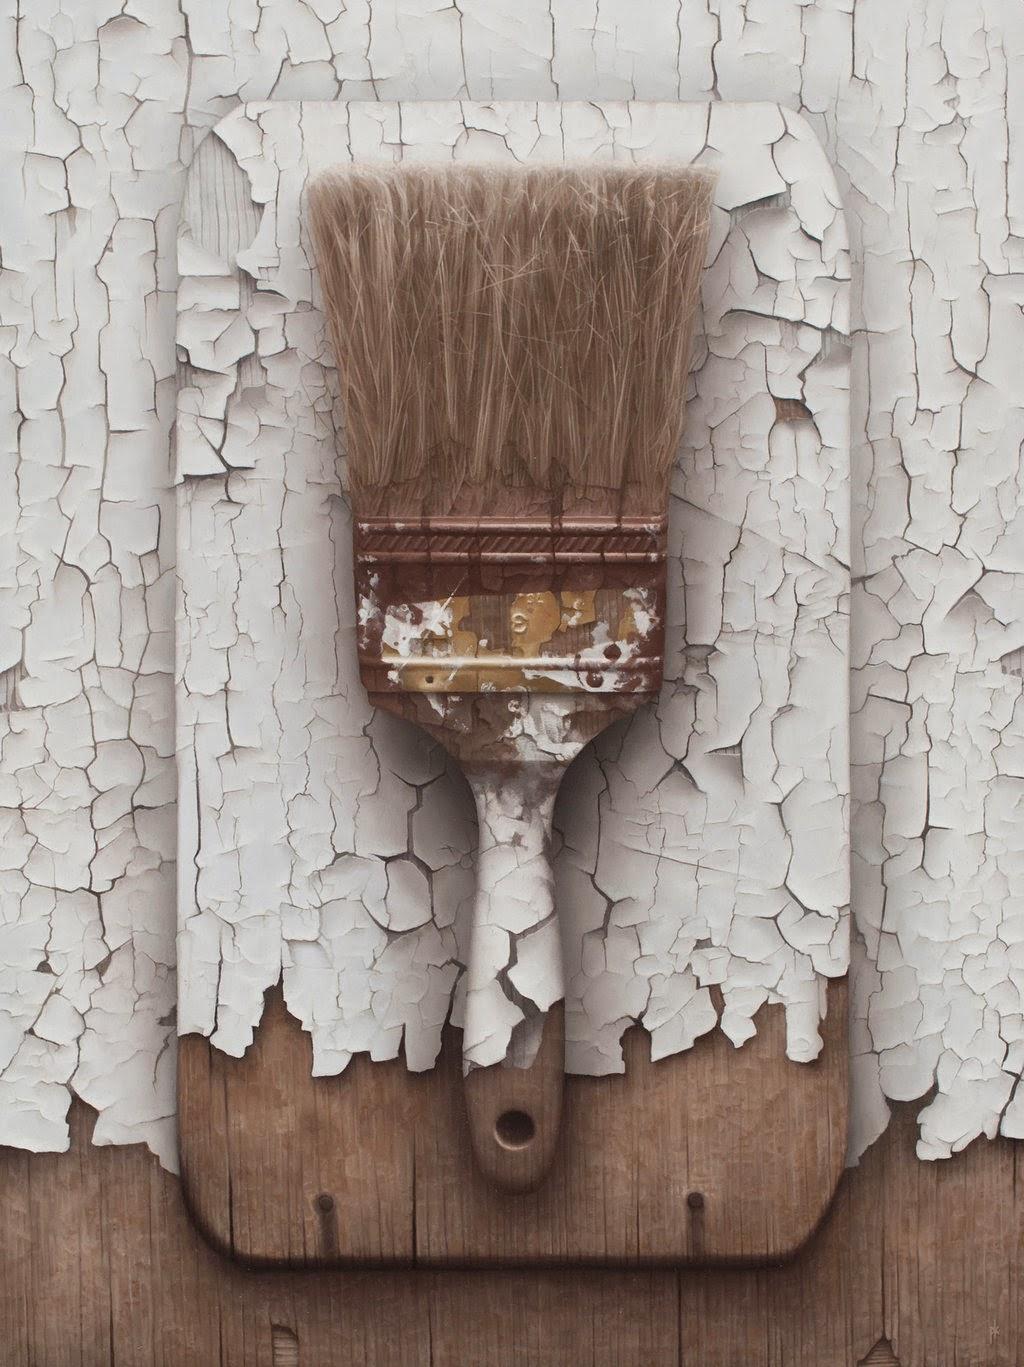 05-Perseverance-Futility-Patrick-Kramer-Hyper-Realistic-Paintings-www-designstack-co